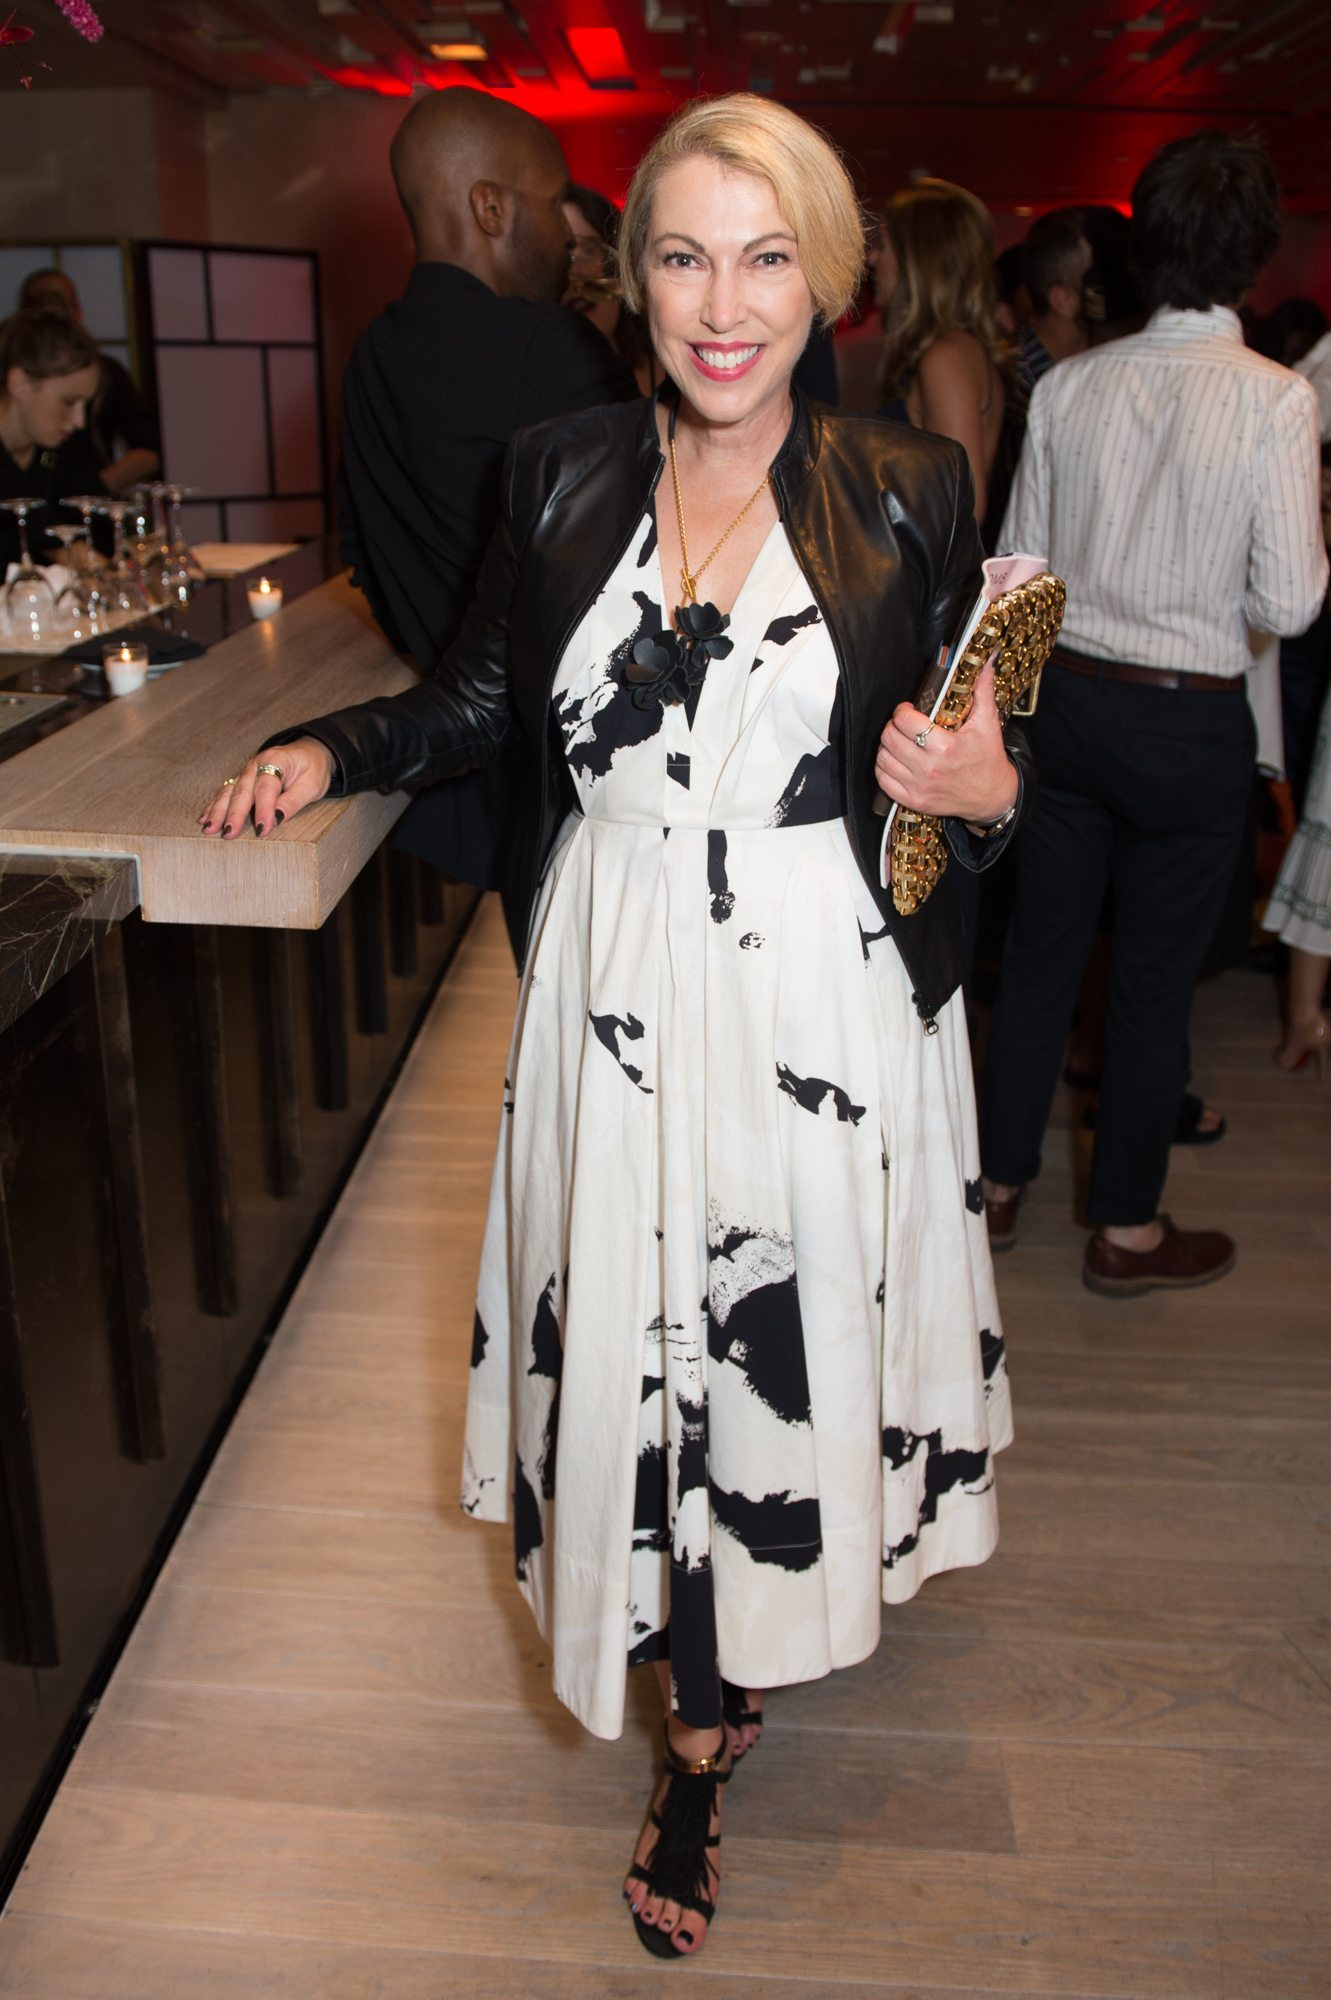 Toronto Life Best Dressed Event. Toronto, ON, Canada. Sep 8, 2016. (Image: Ryan Emberley)